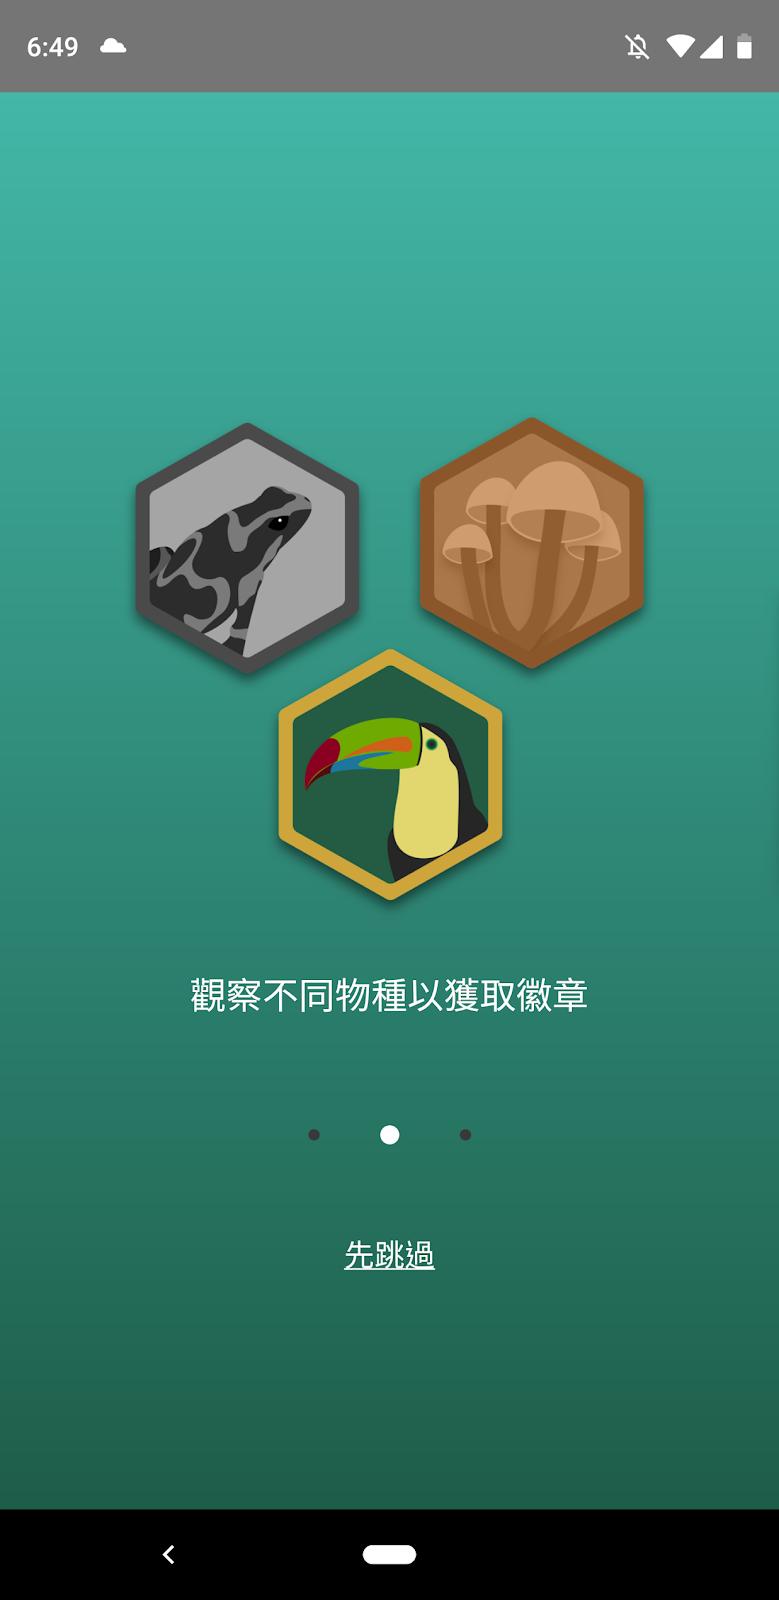 Seek 自然生物辨識App 中文版,AI 偵測昆蟲、鳥類與動植物